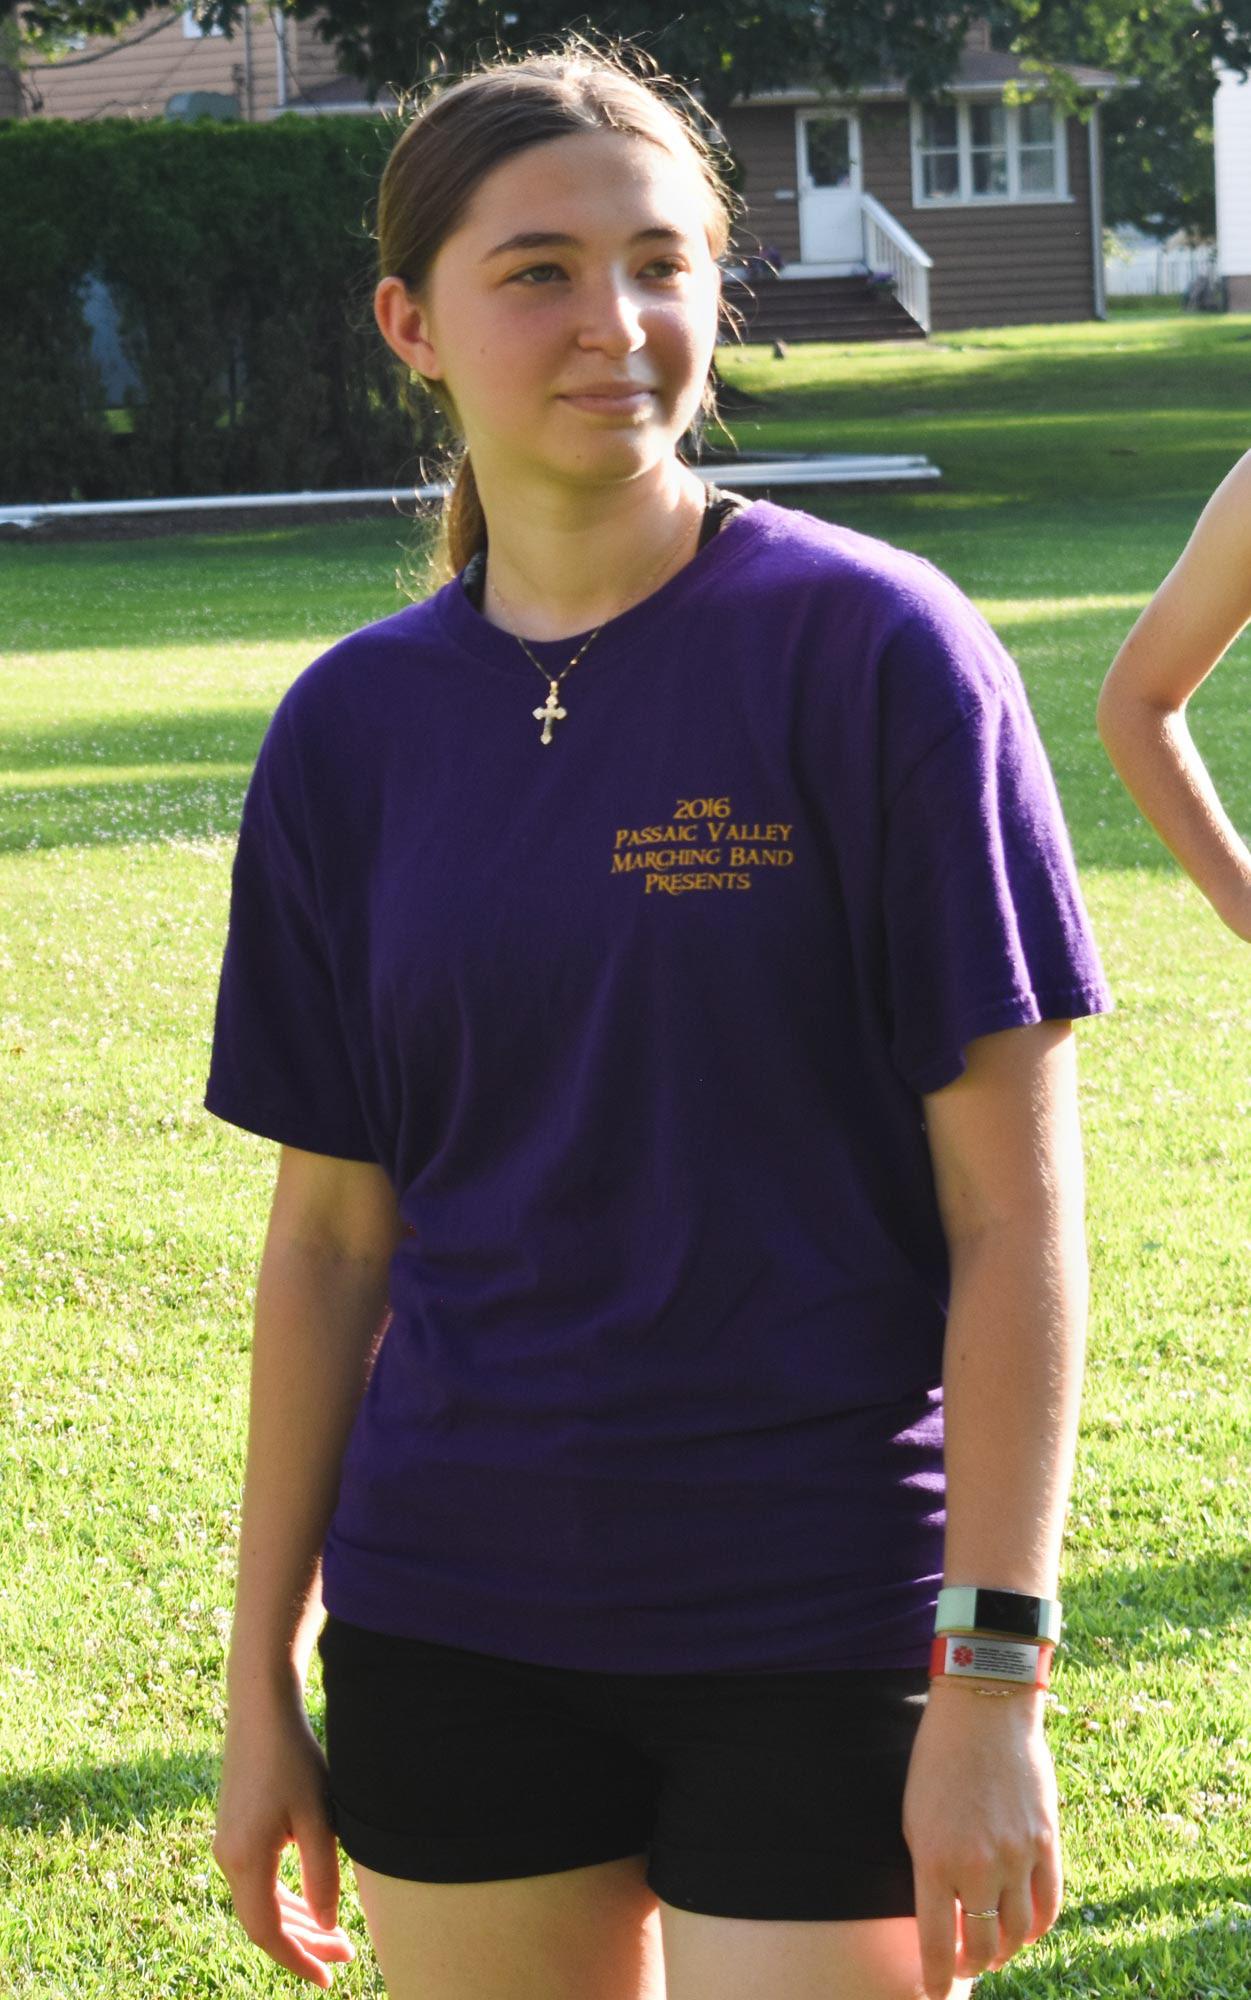 Erin Colgan Hunchback Of Notre Dame Marching Band T Shirt Logo